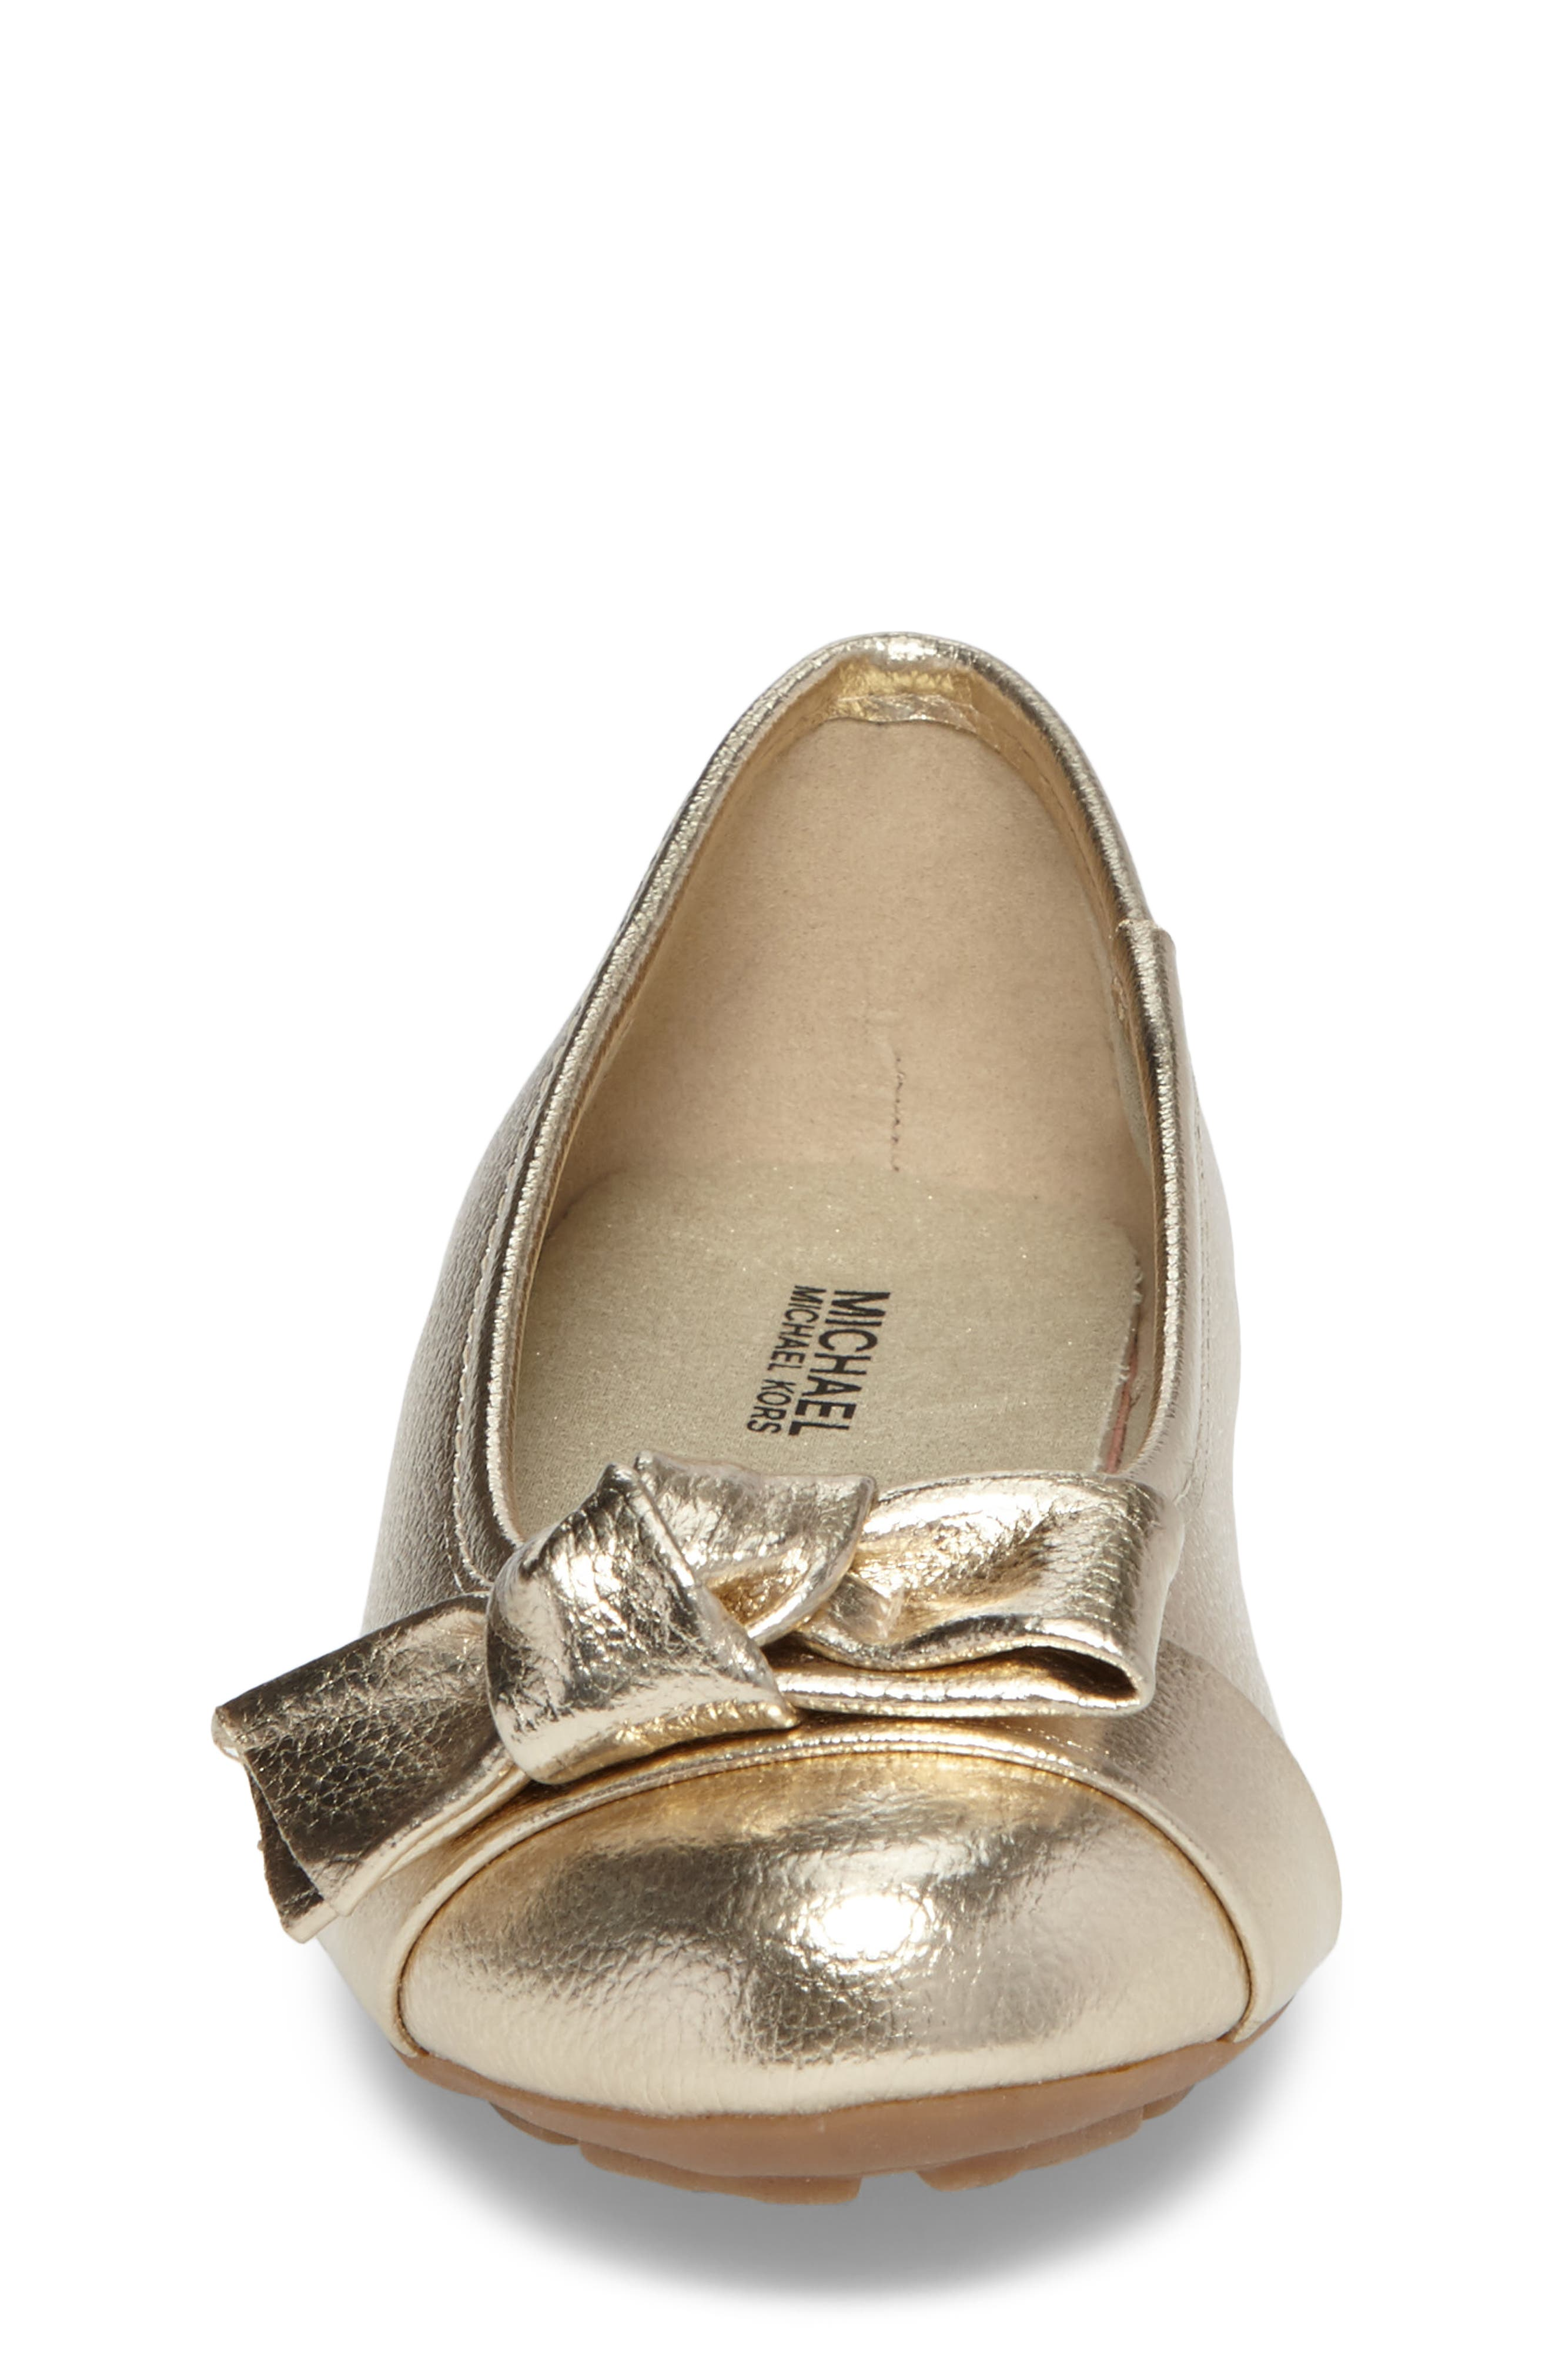 Rover Cora Ballet Flat,                             Alternate thumbnail 4, color,                             710